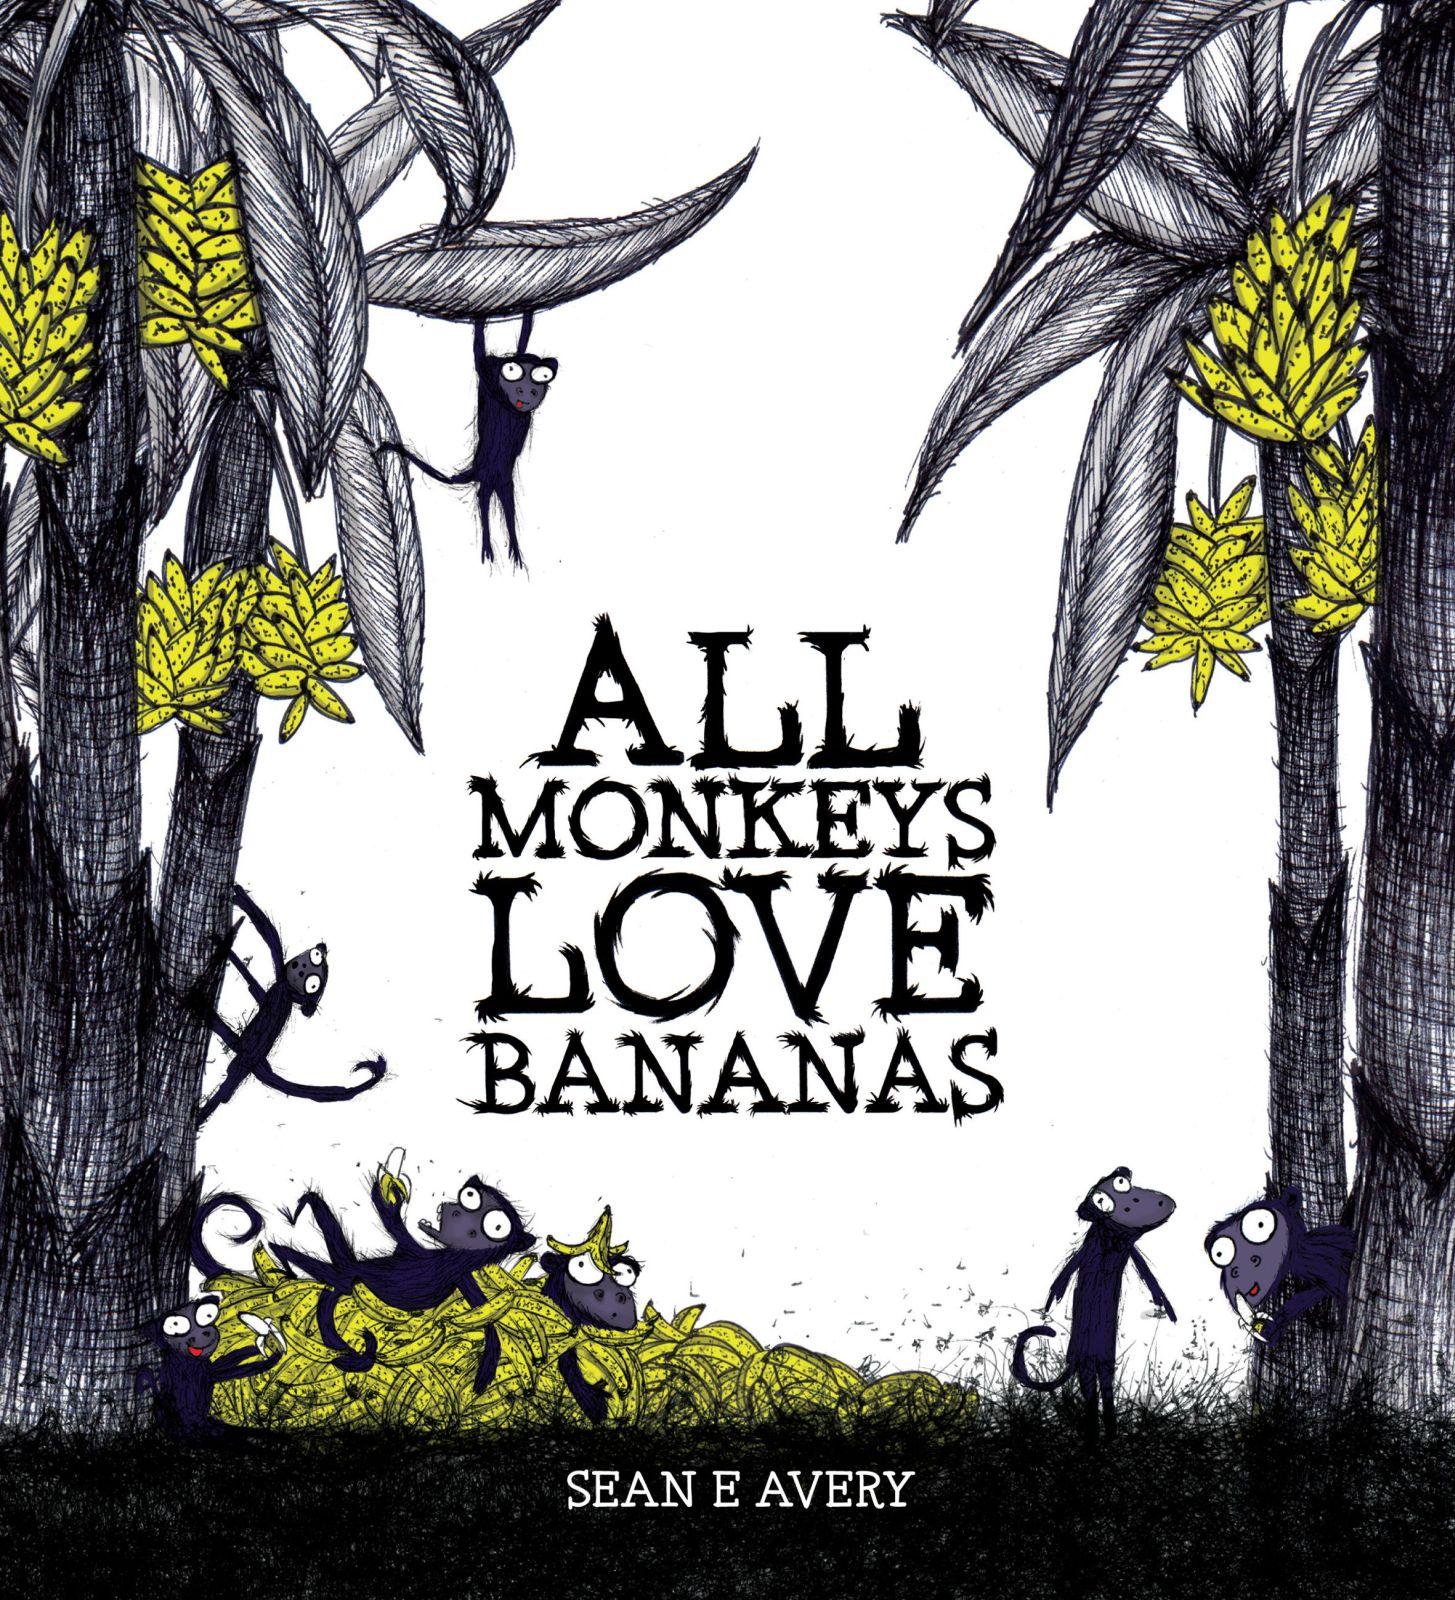 Sean-Avery-All-Monkeys-Love-Bananas.jpg